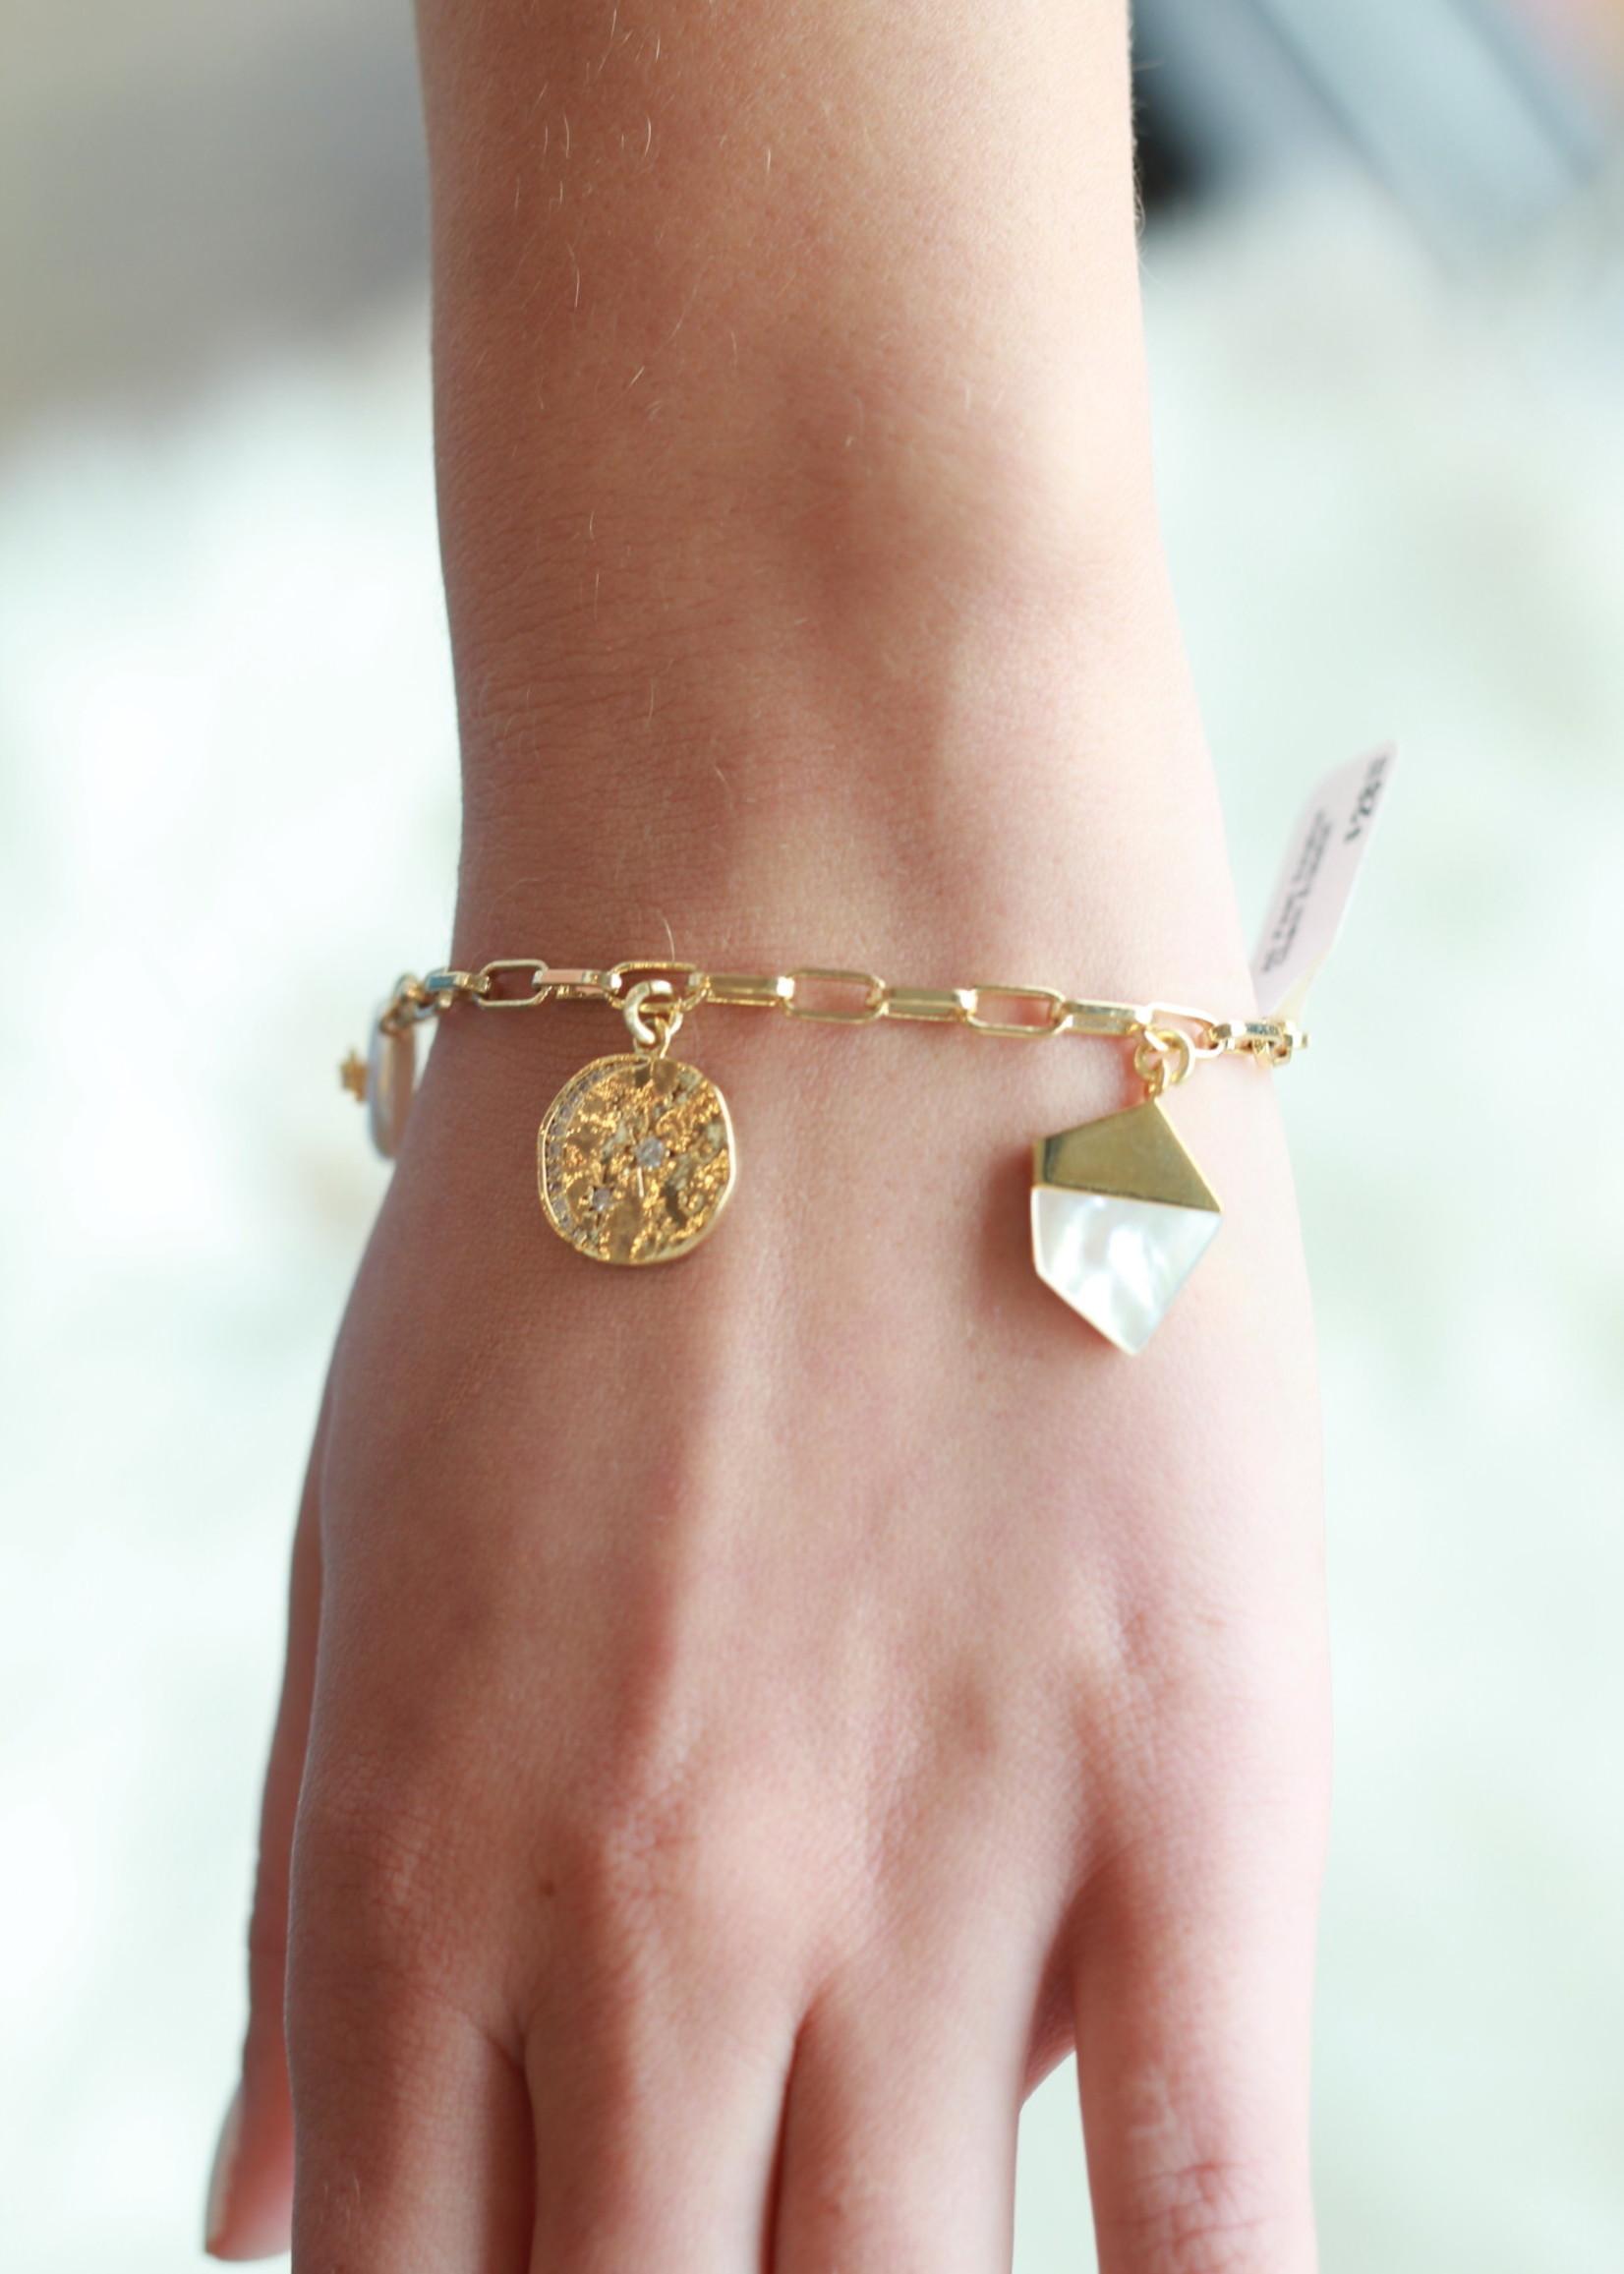 Allison Conway AC Pearl Solstice Charm Bracelet